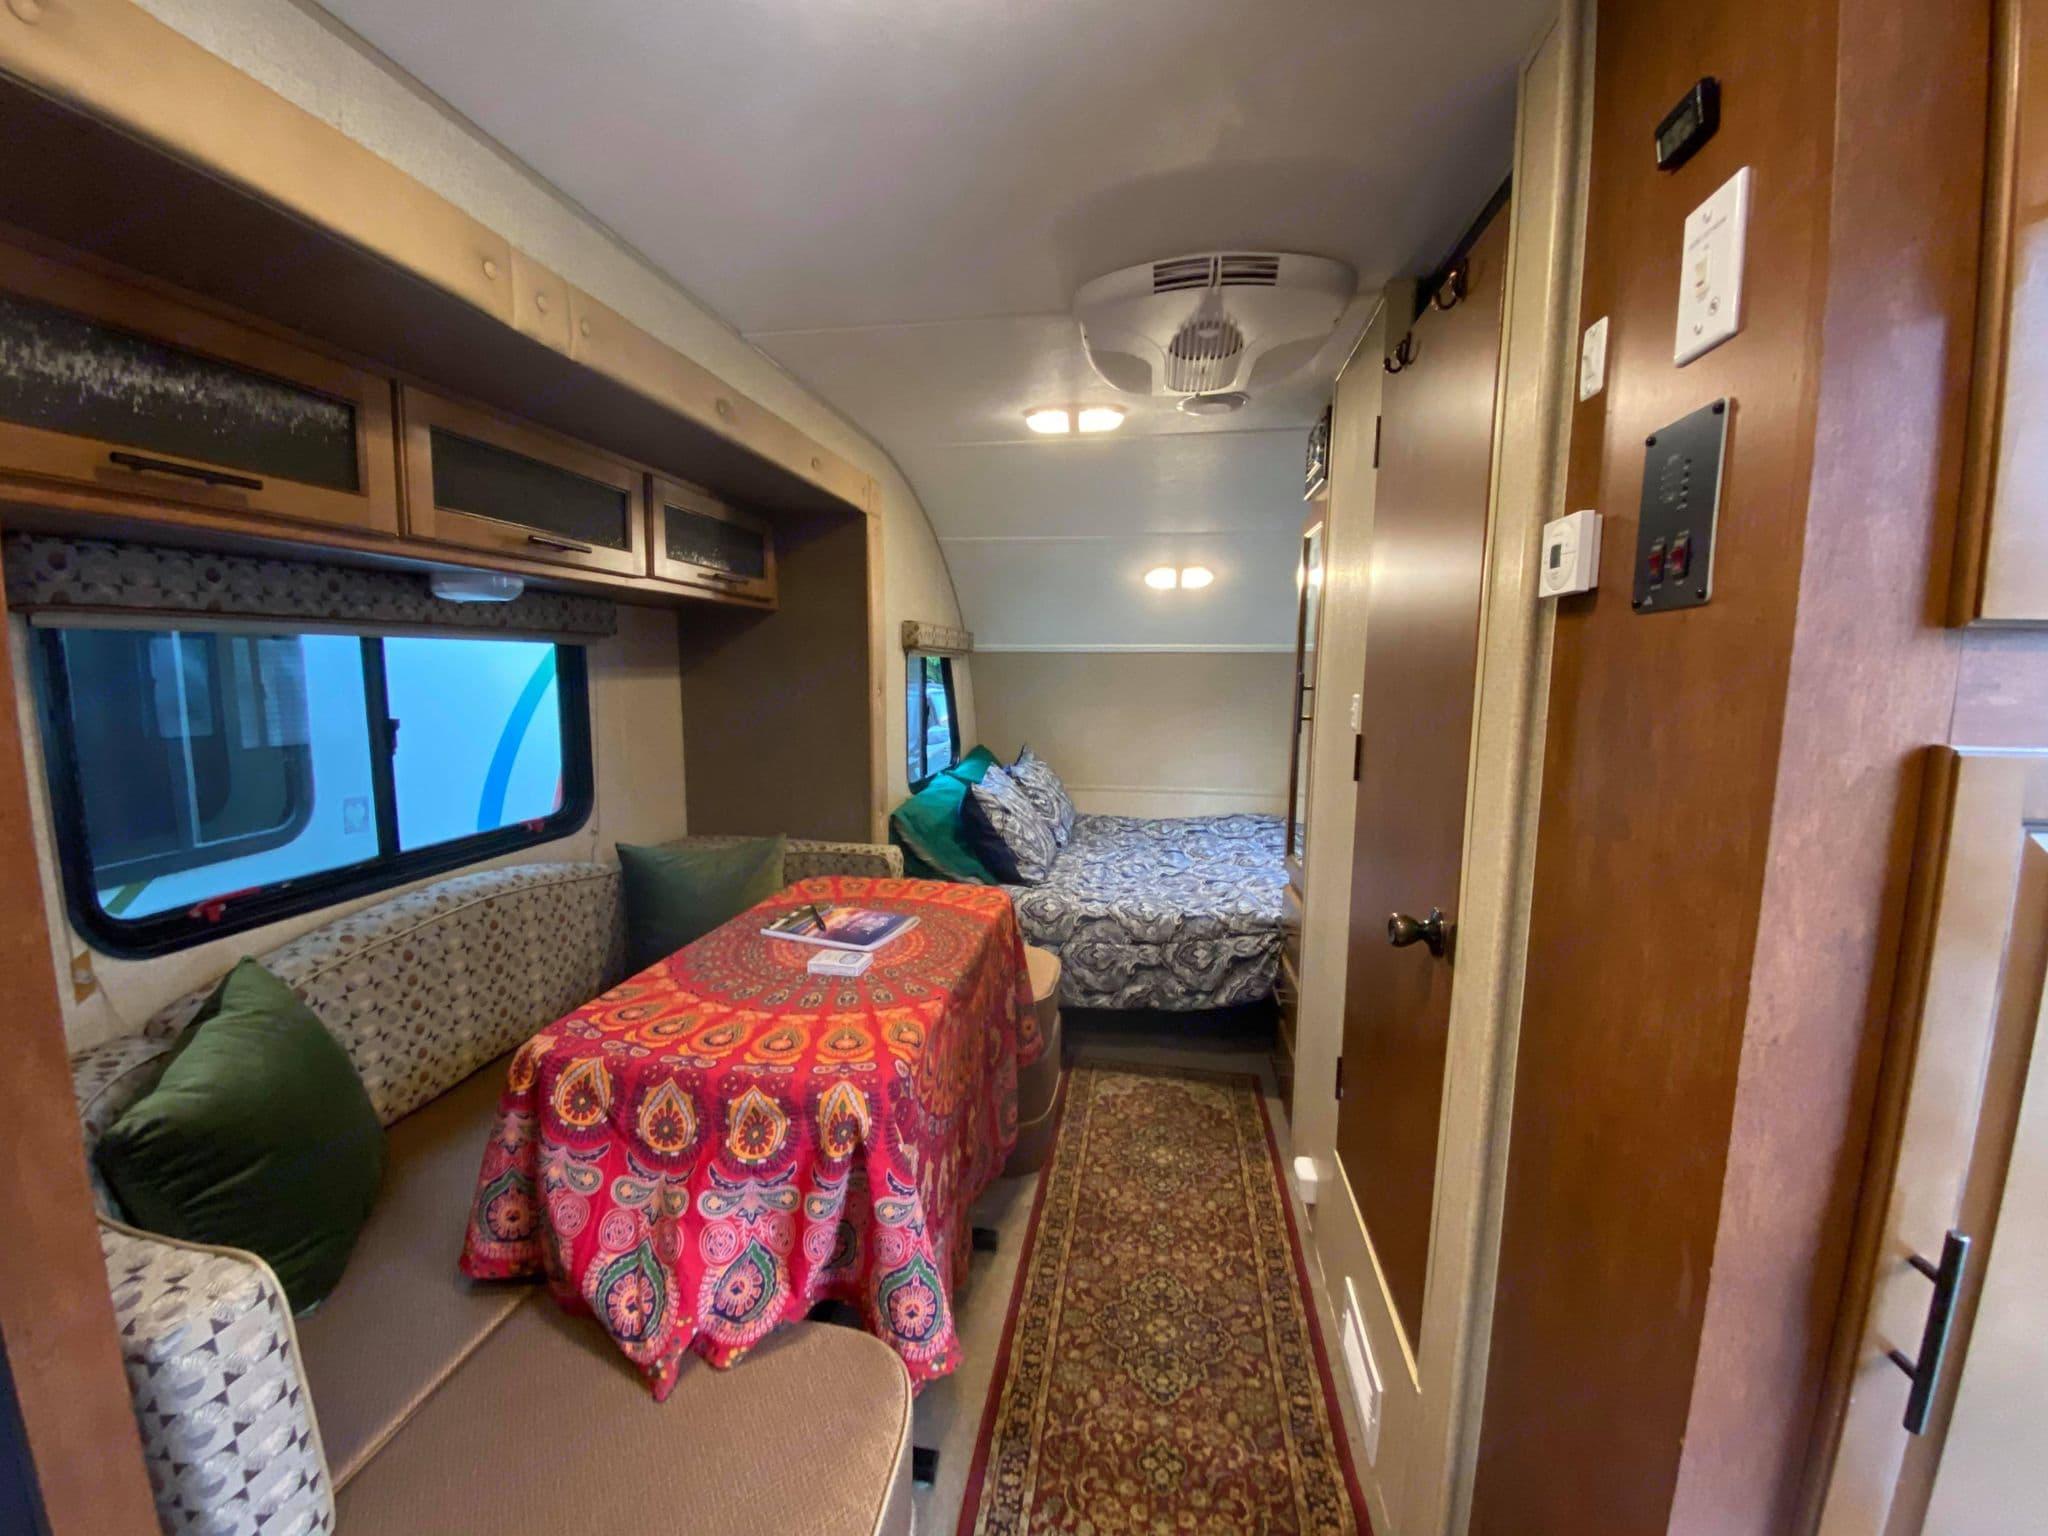 The dinette area slides out for additional room inside the camper. Forest River R-Pod 2014